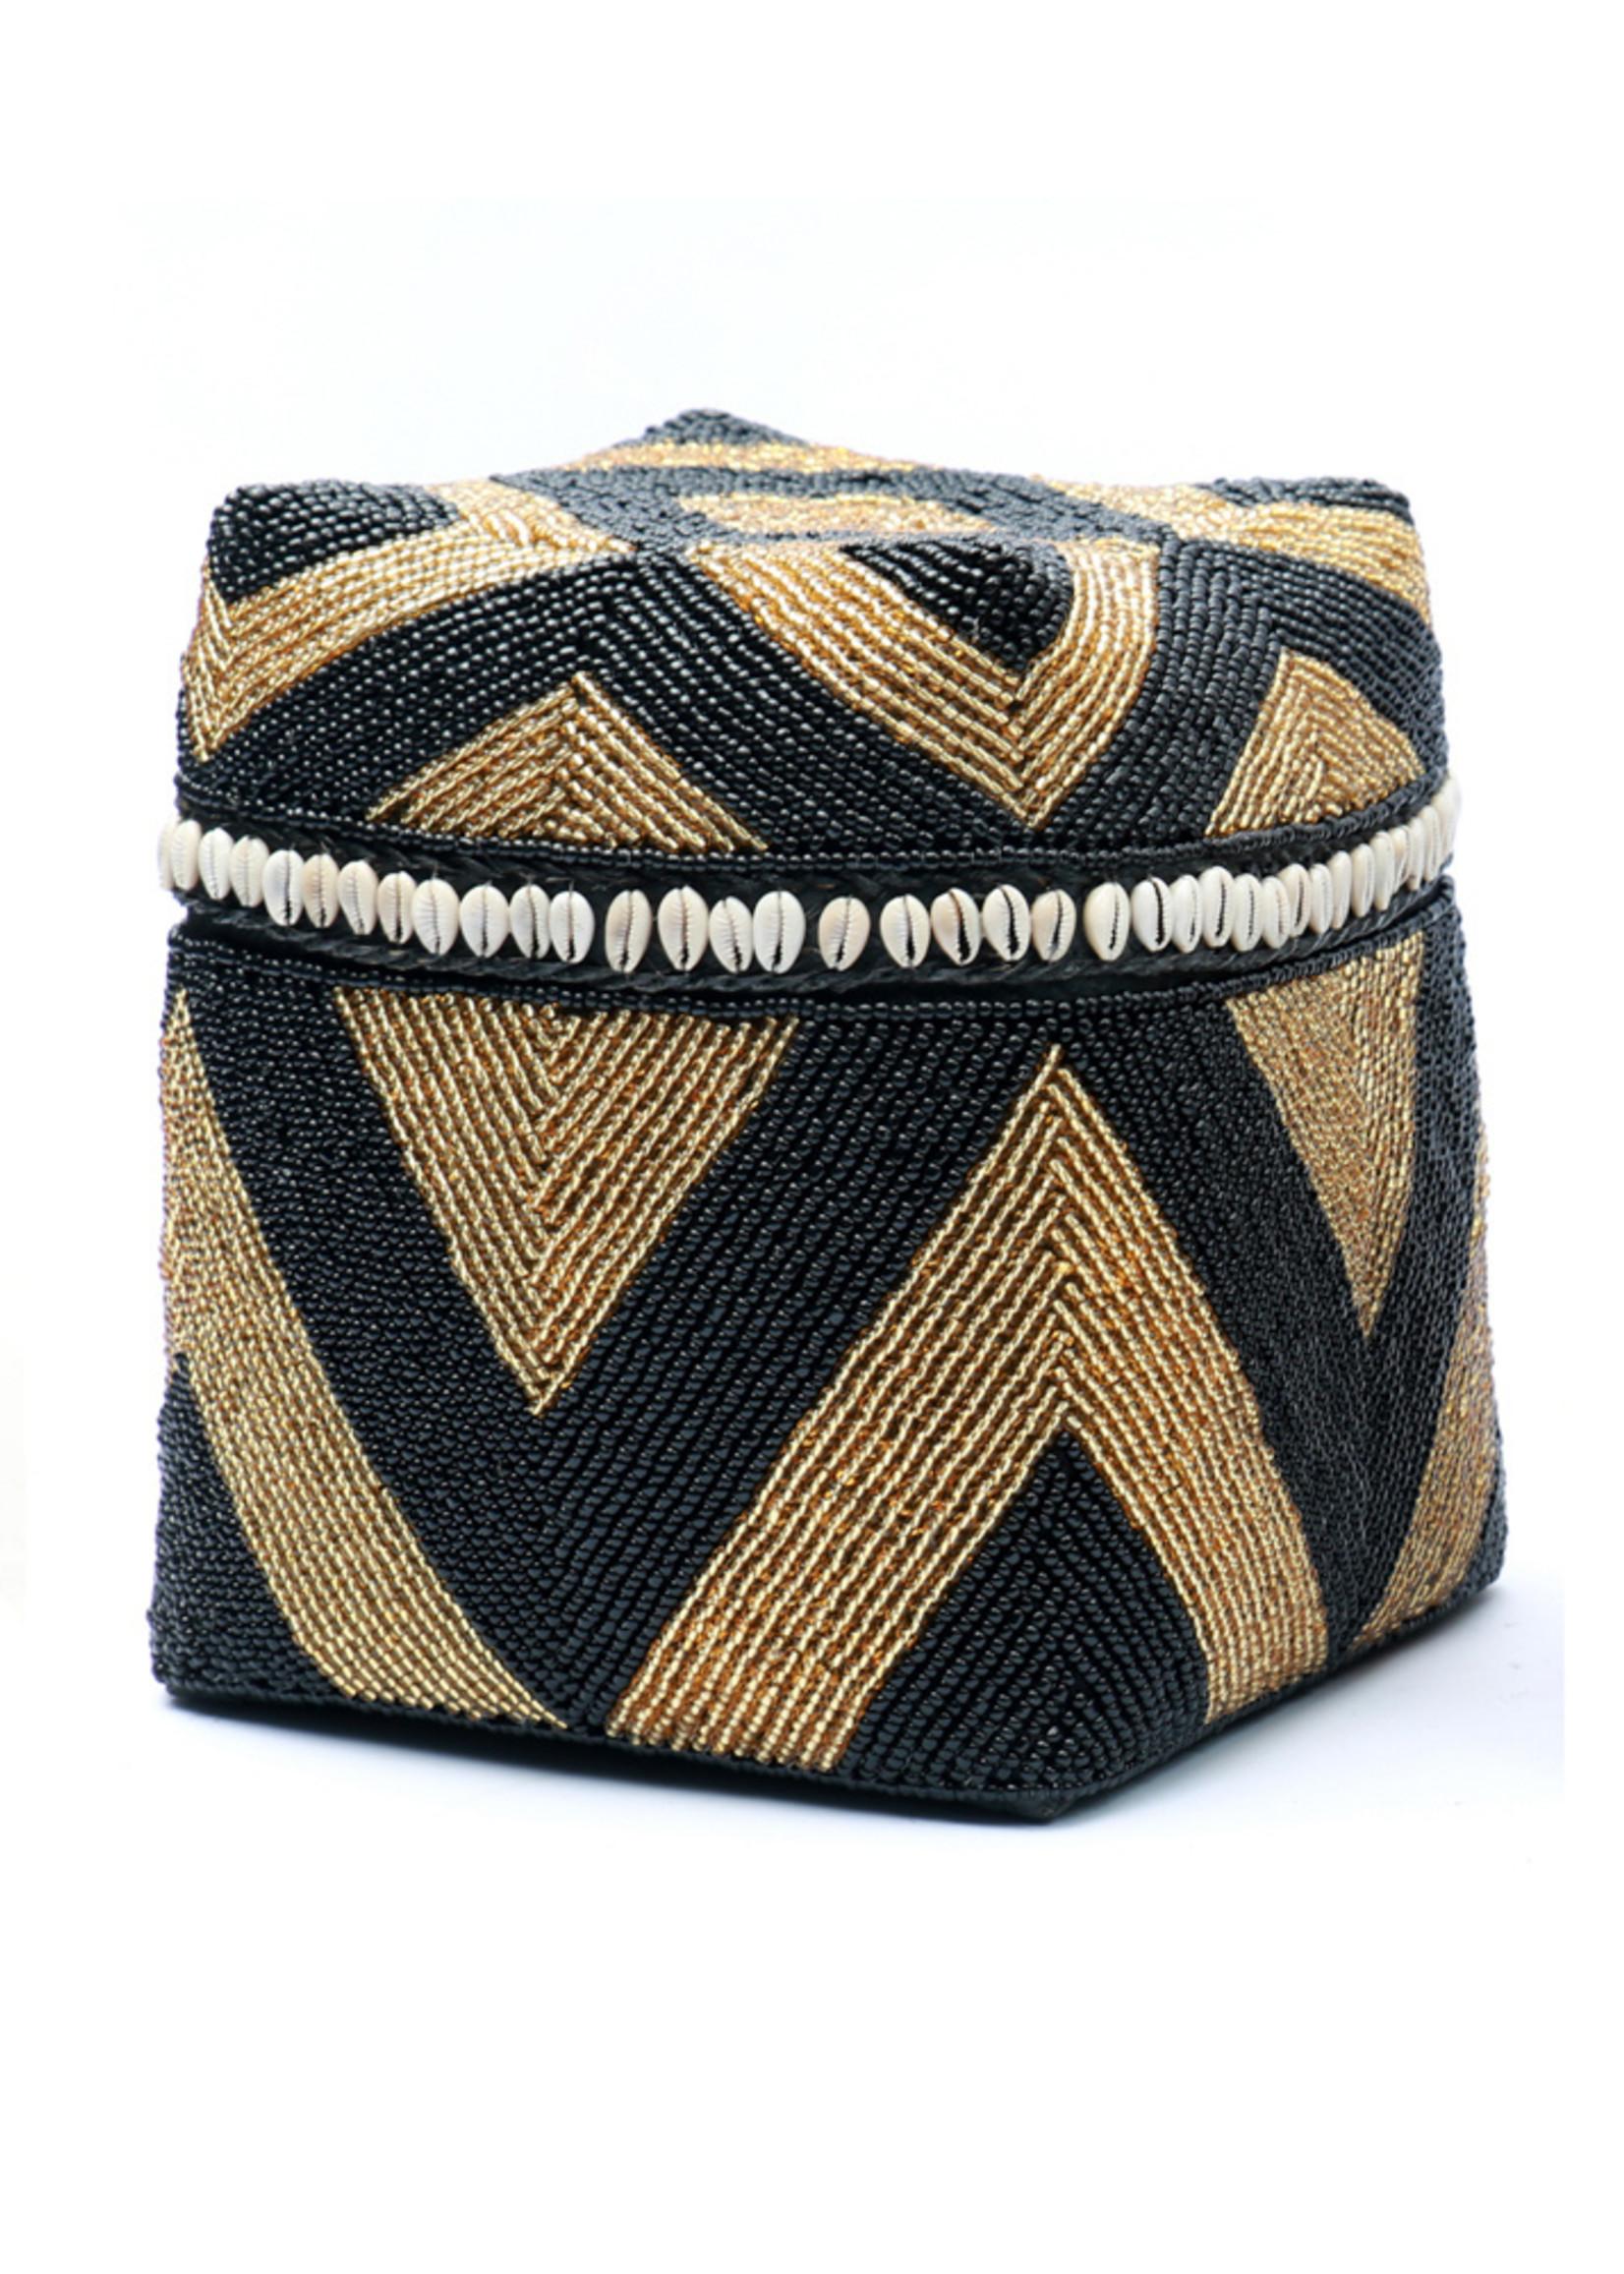 The Beaded Basket Cowrie Diamond High - Black Gold - L